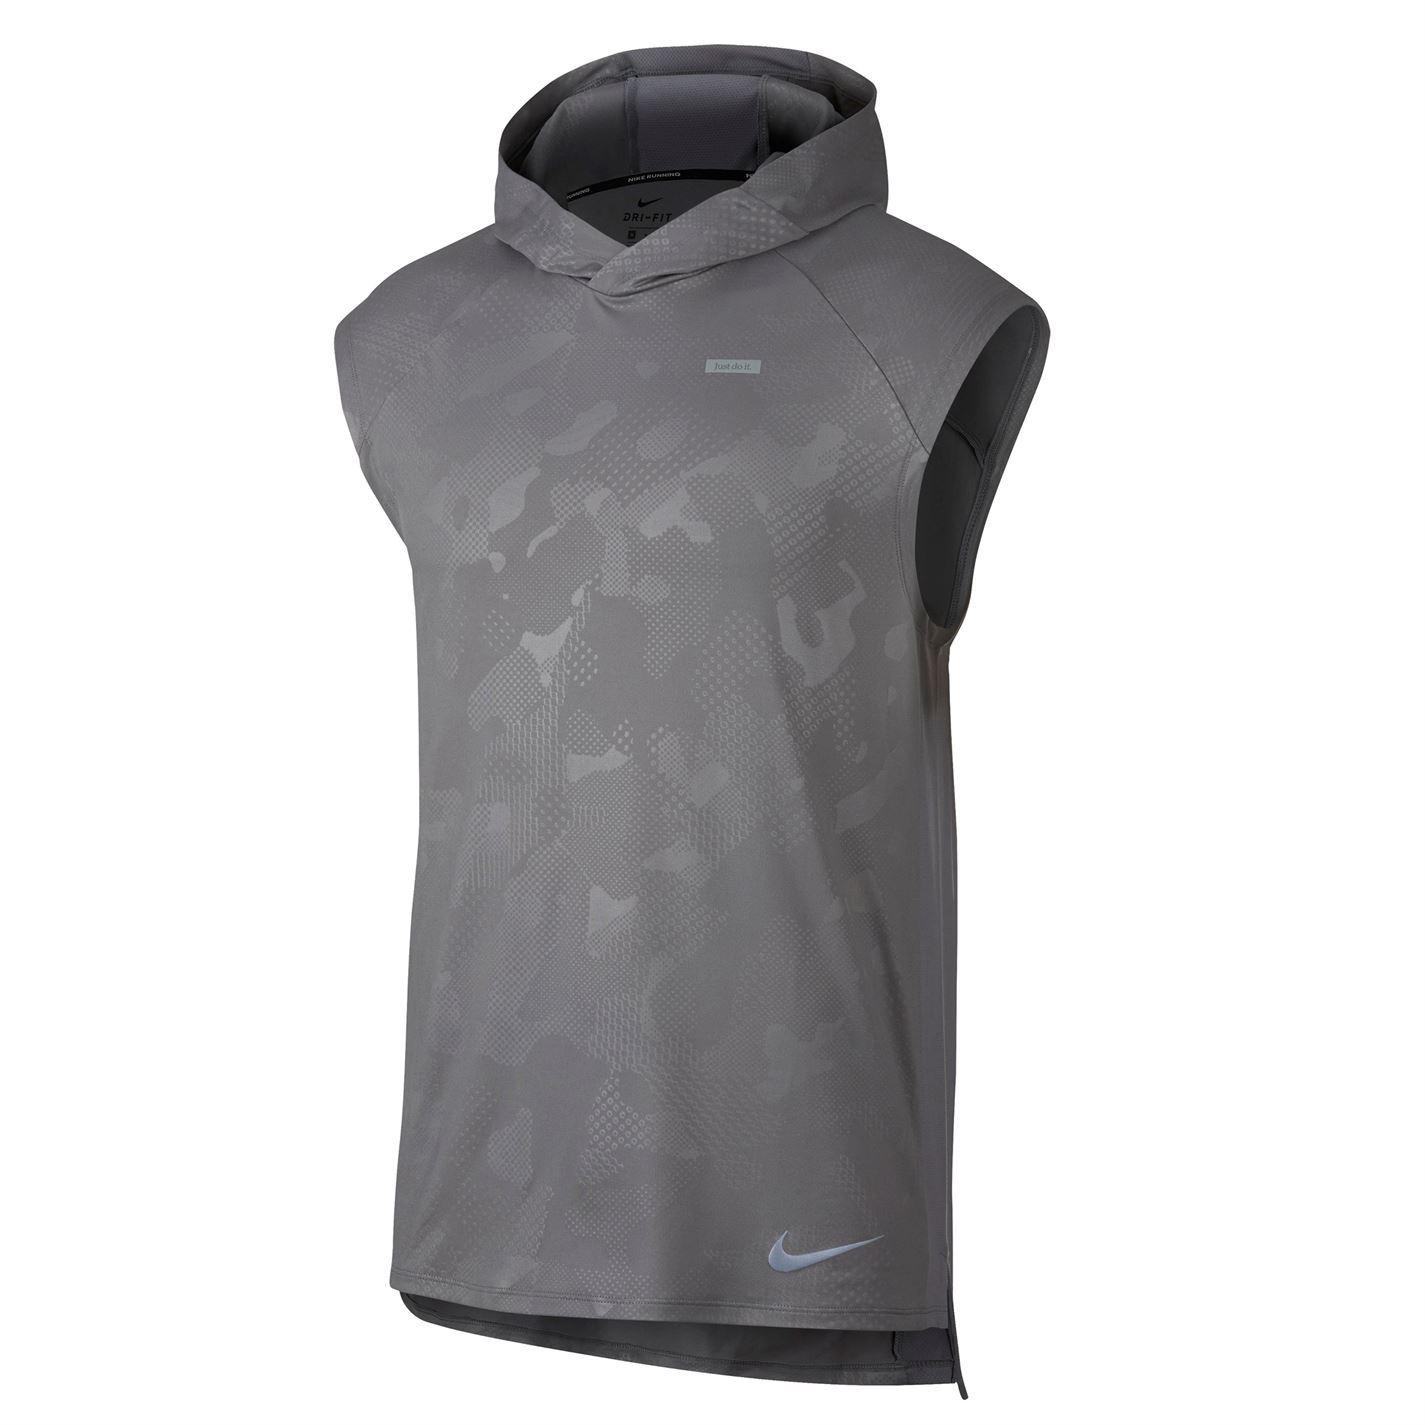 58488059 ... Nike Element Sleeveless Running Hoodie Mens Singlet Tops Vest Grey  X-Large